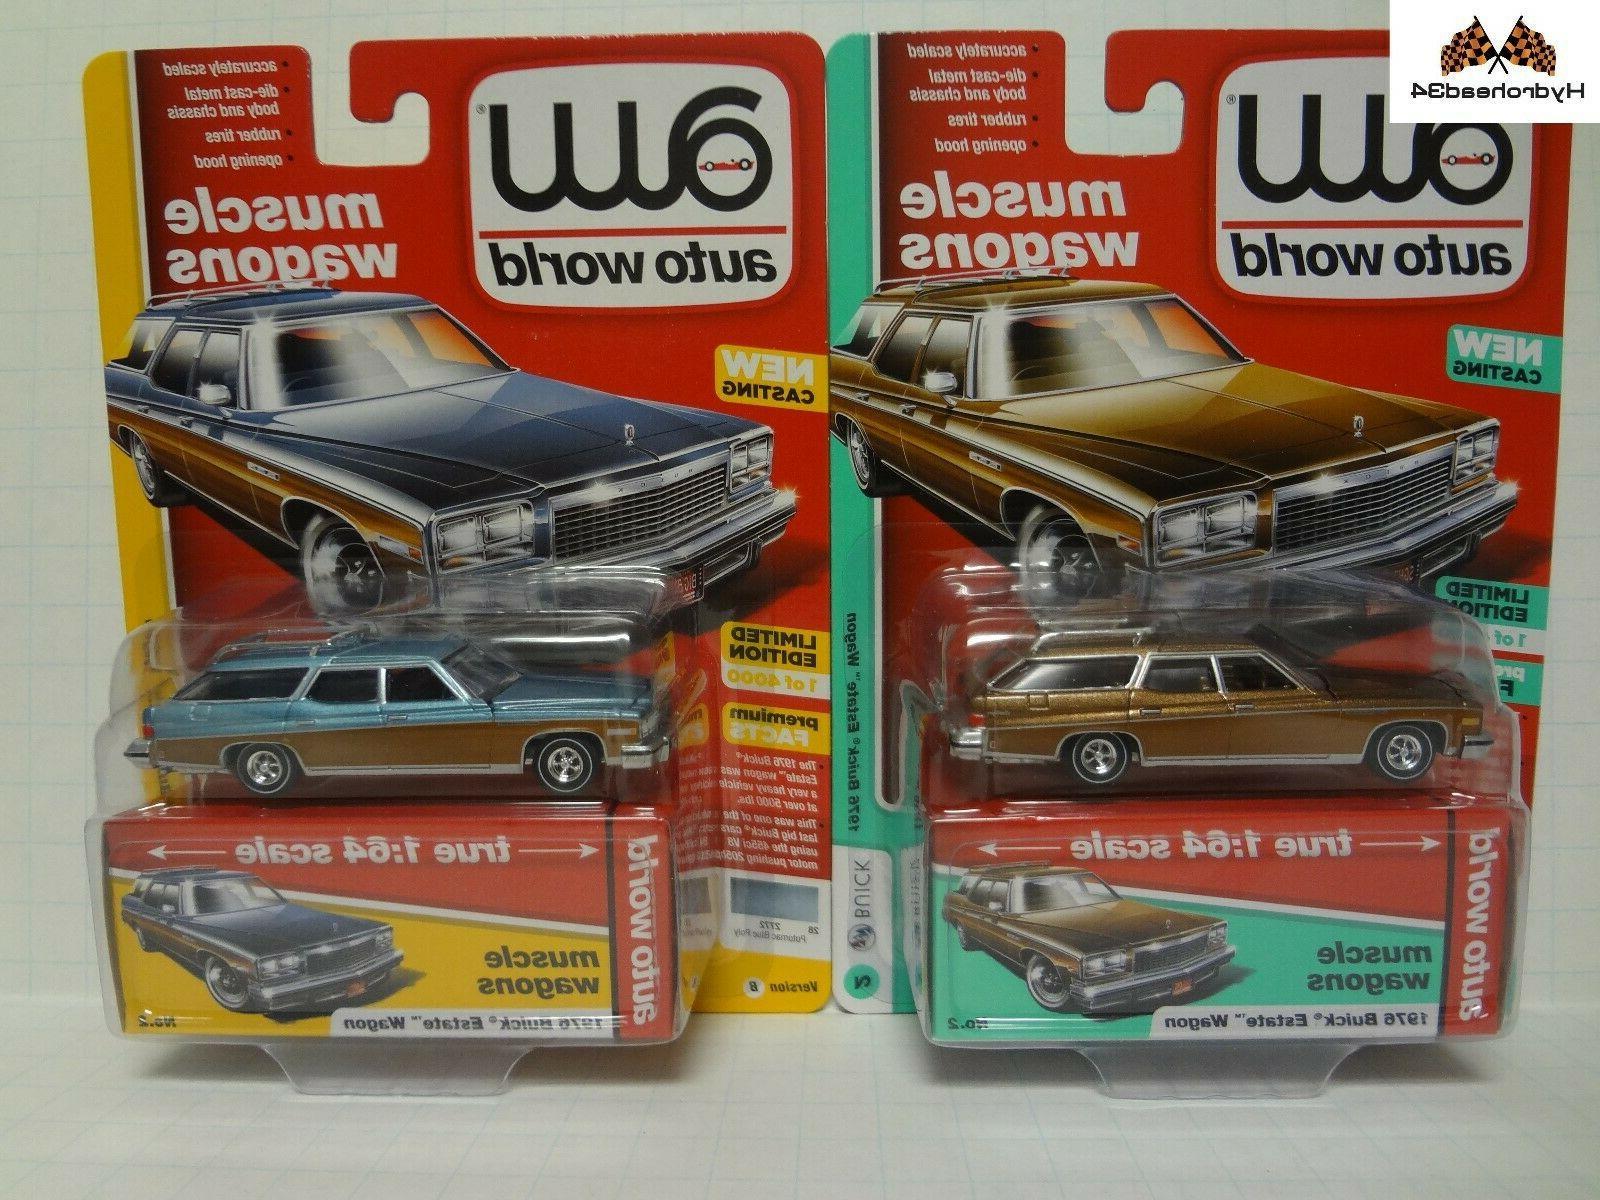 1976 buick estate wagon aw64212 set of